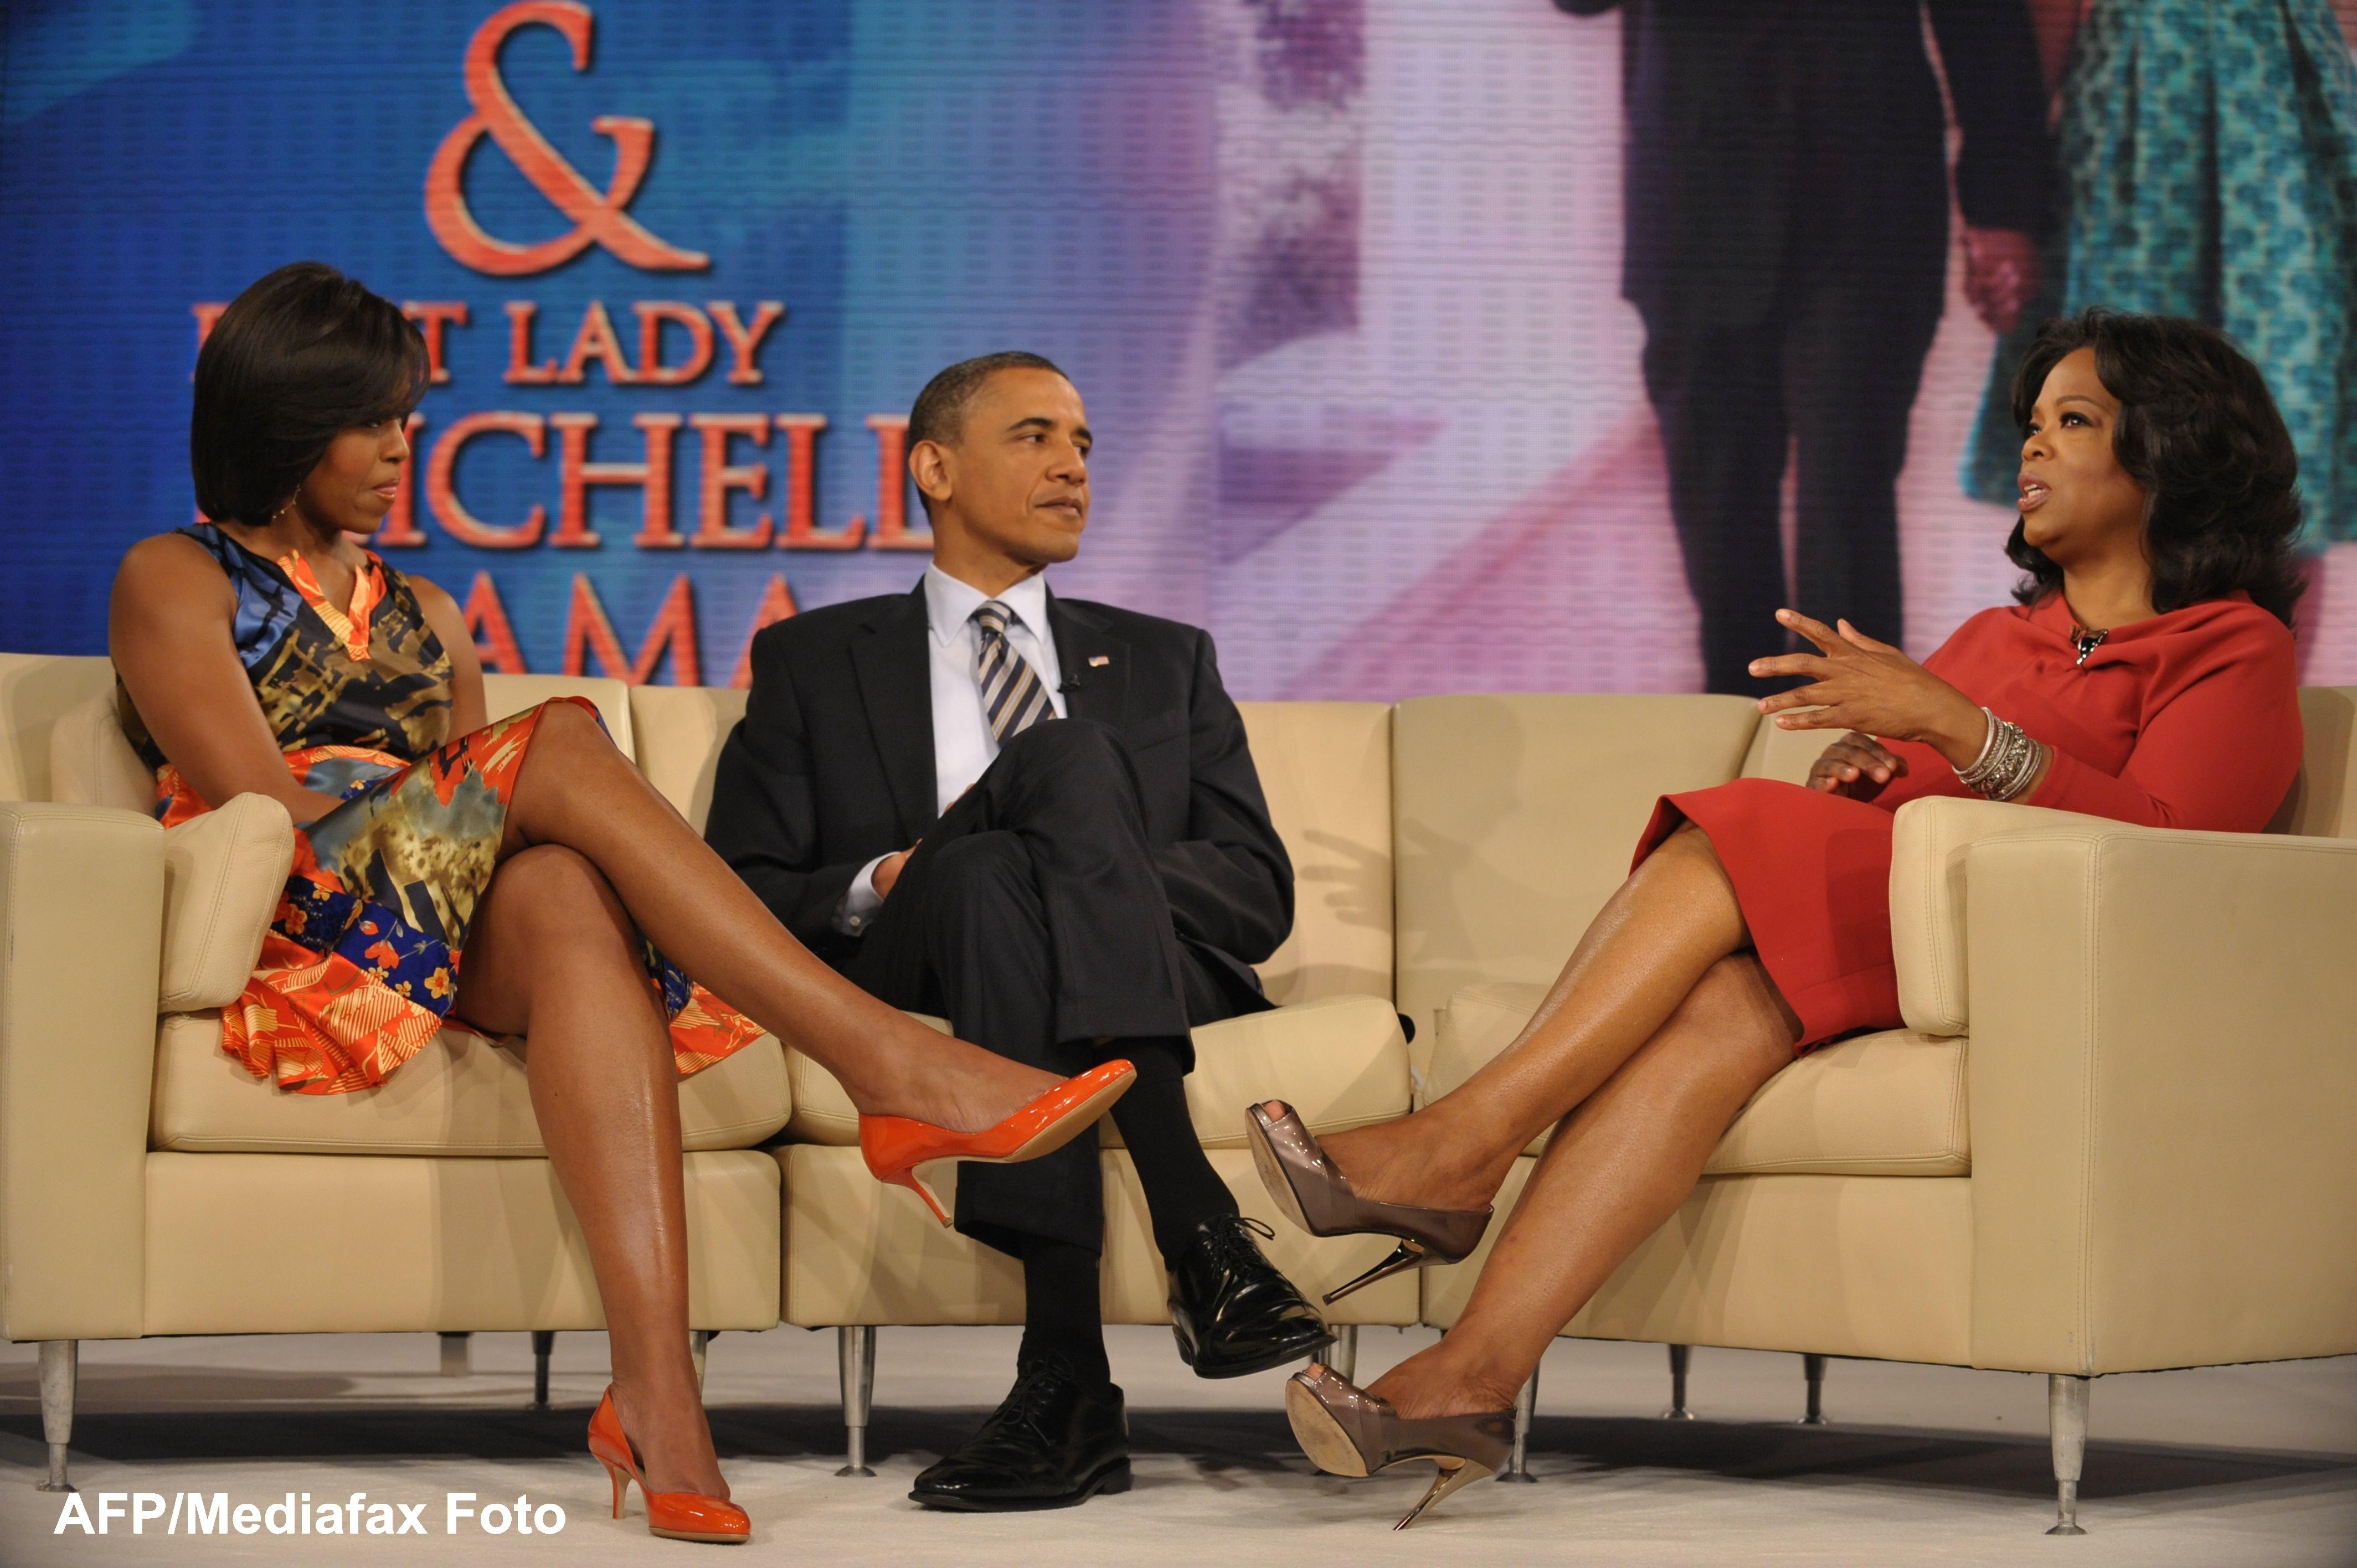 Alegeri in SUA. Mitt Romney l-a avut pe Clint Eastwood, Barack Obama o aduce pe Oprah Winfrey